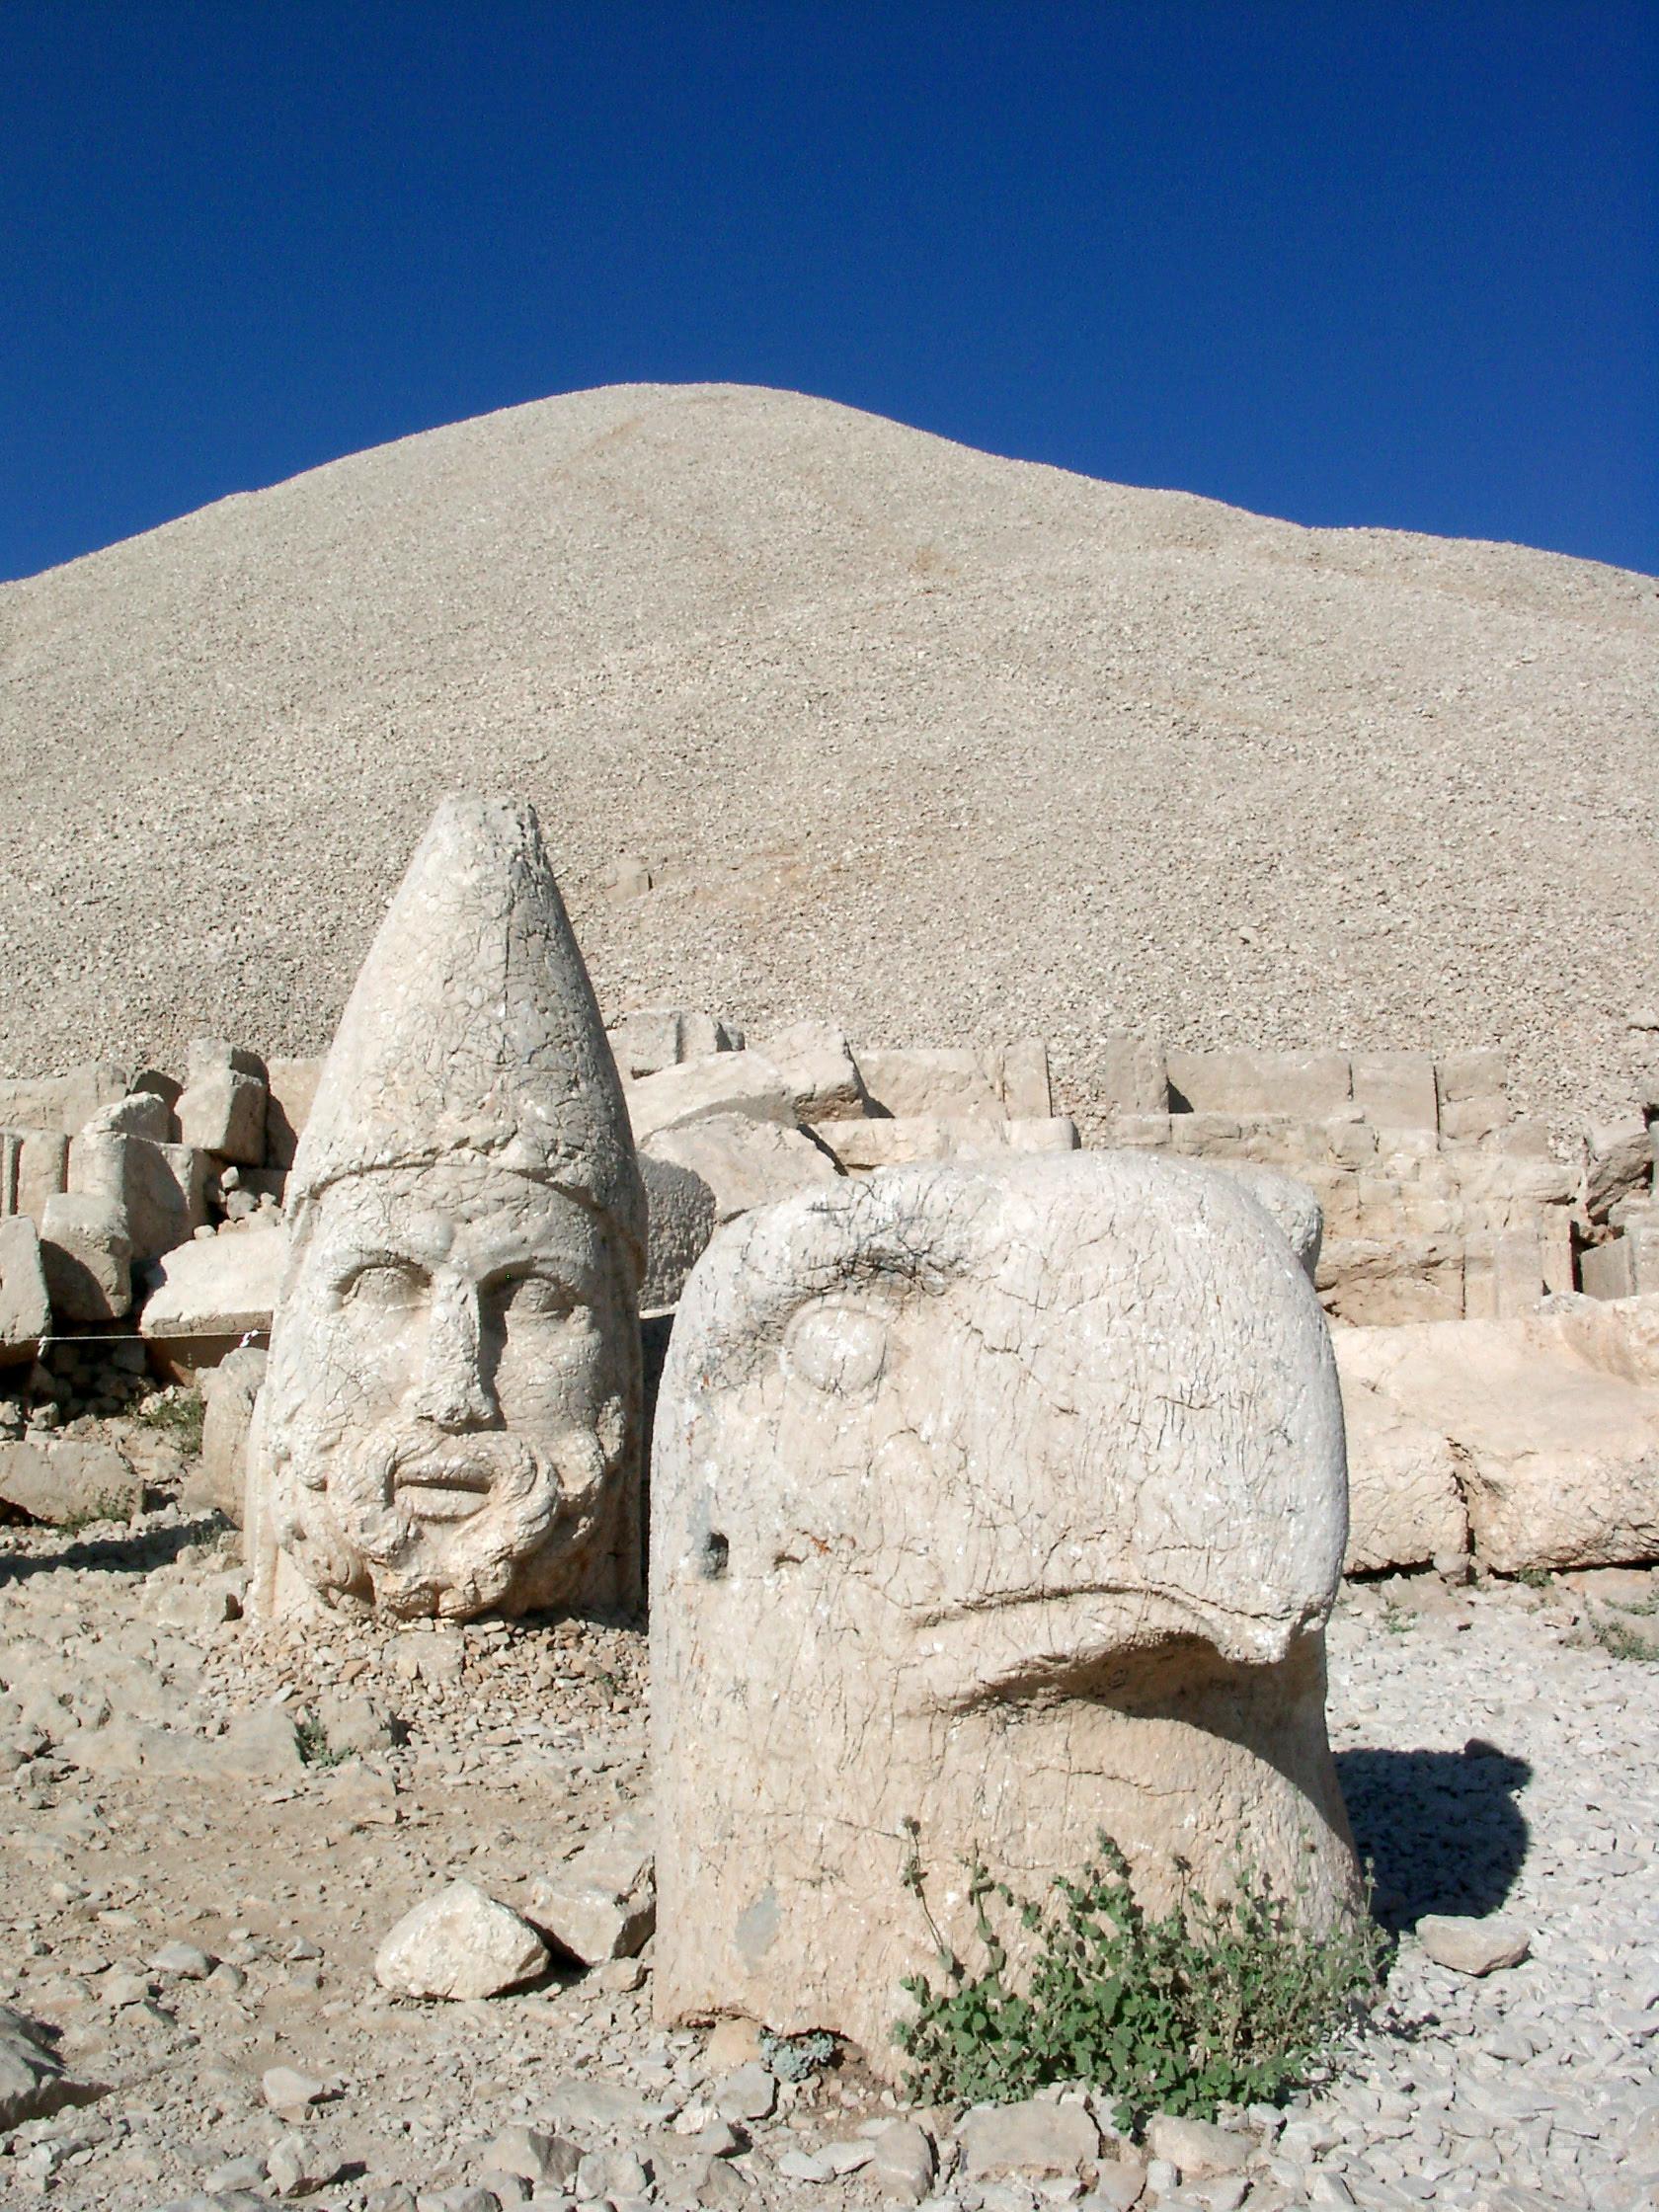 http://upload.wikimedia.org/wikipedia/commons/a/ad/Mount_Nemrut.jpg